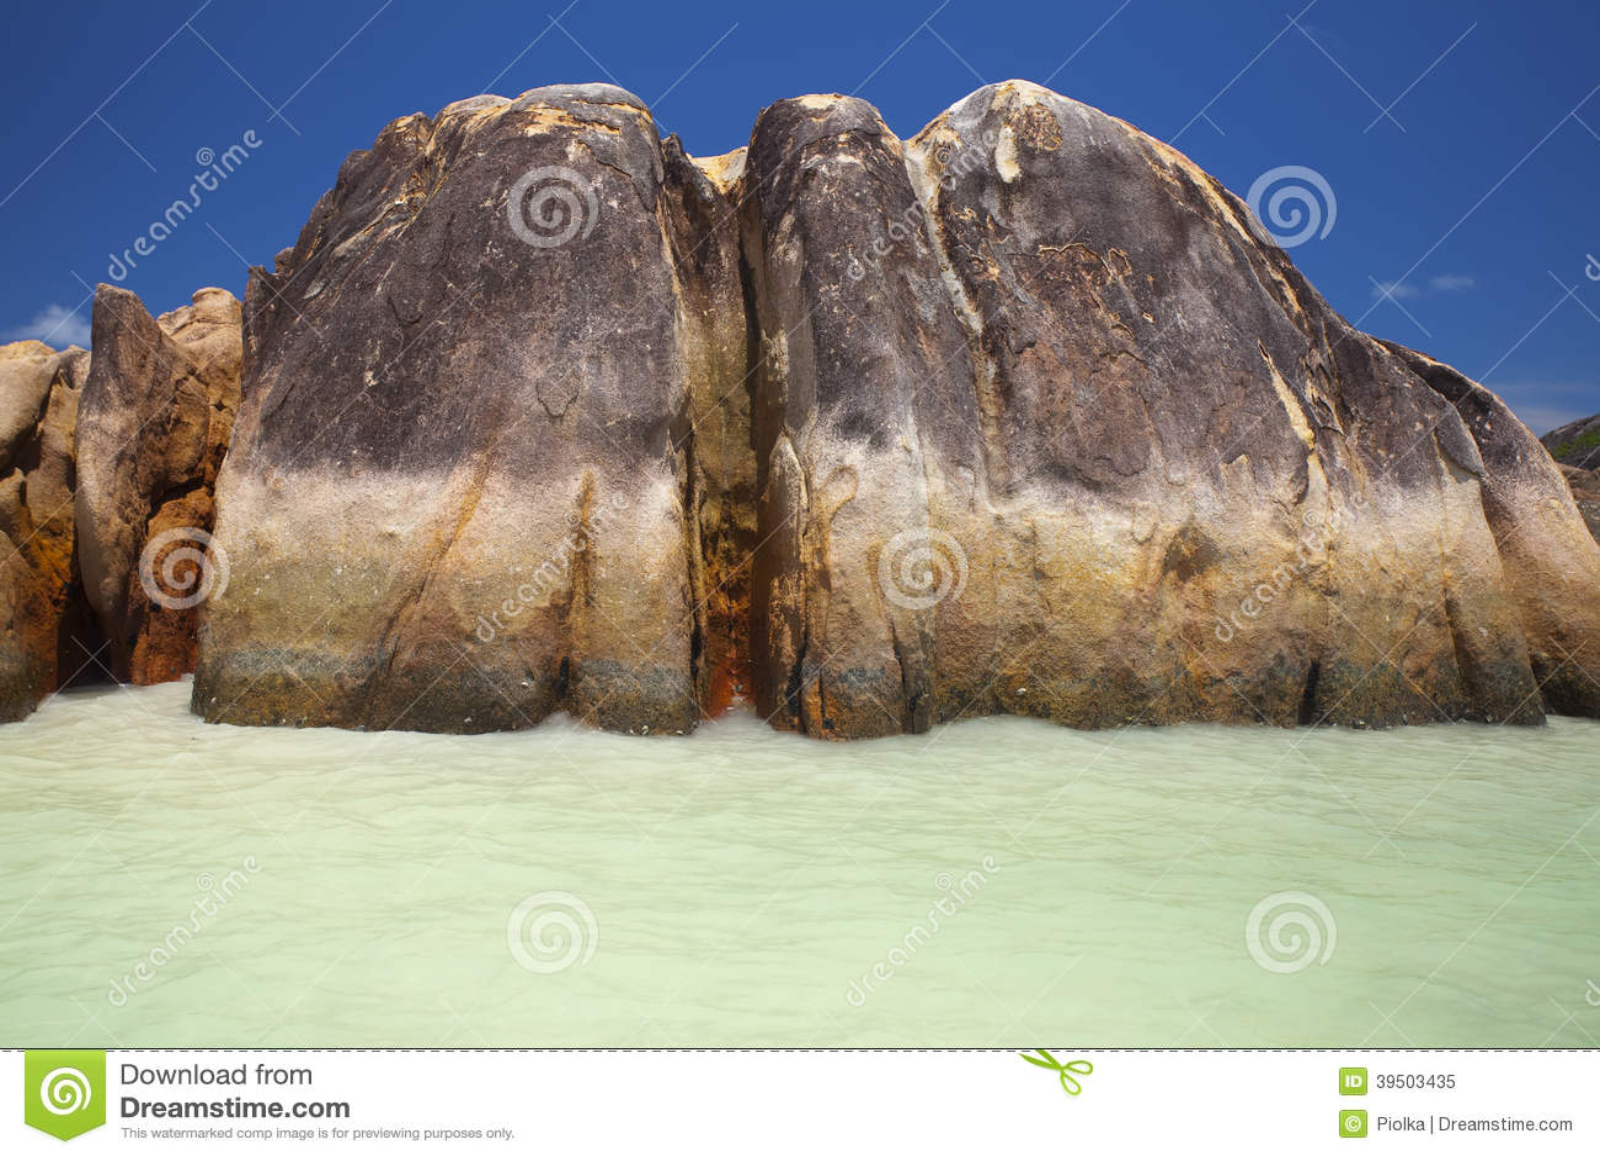 Granite rocks in the water